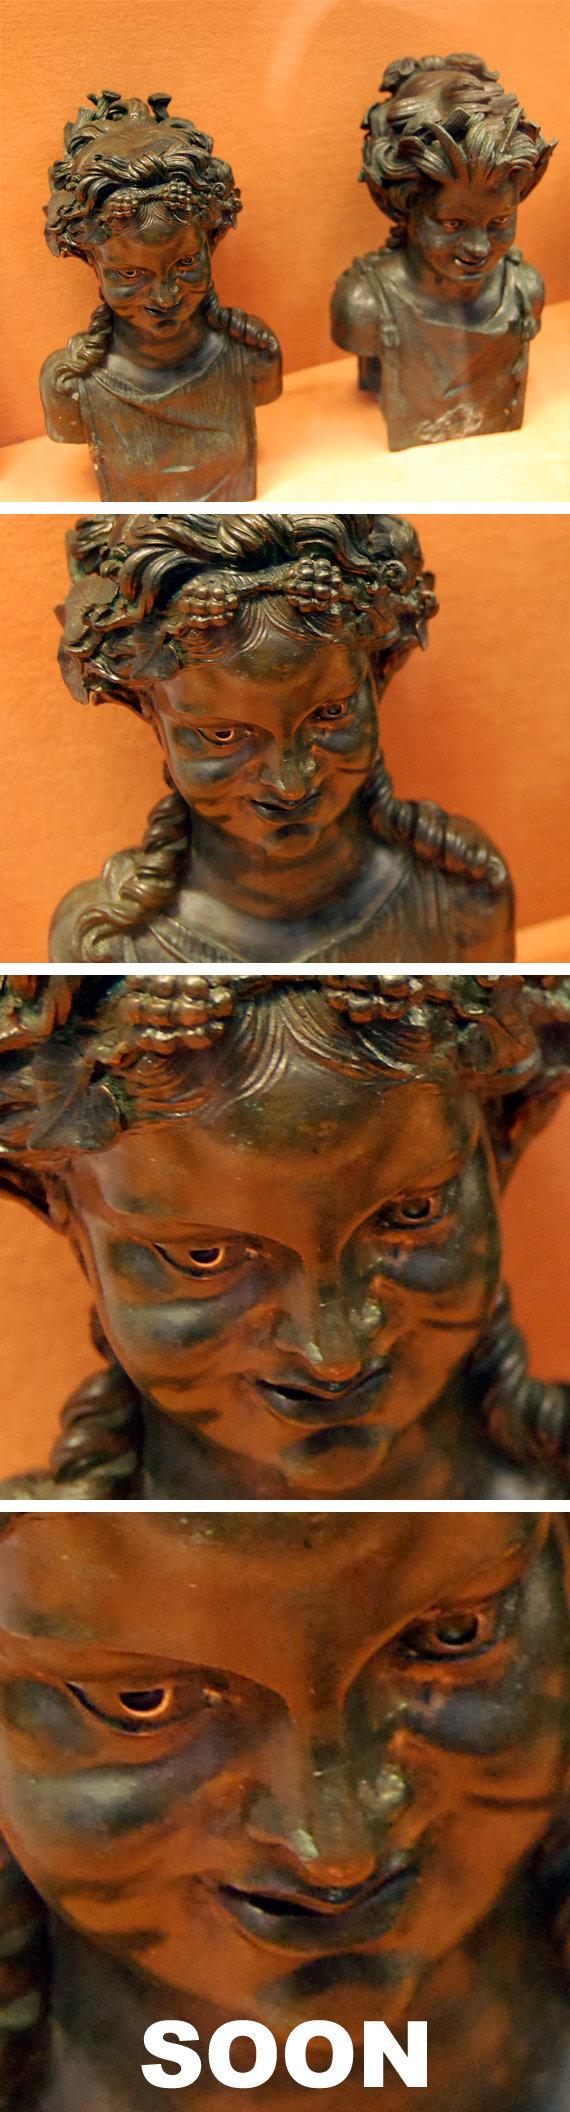 bend over. italian sculptures... Blink and your dead soon